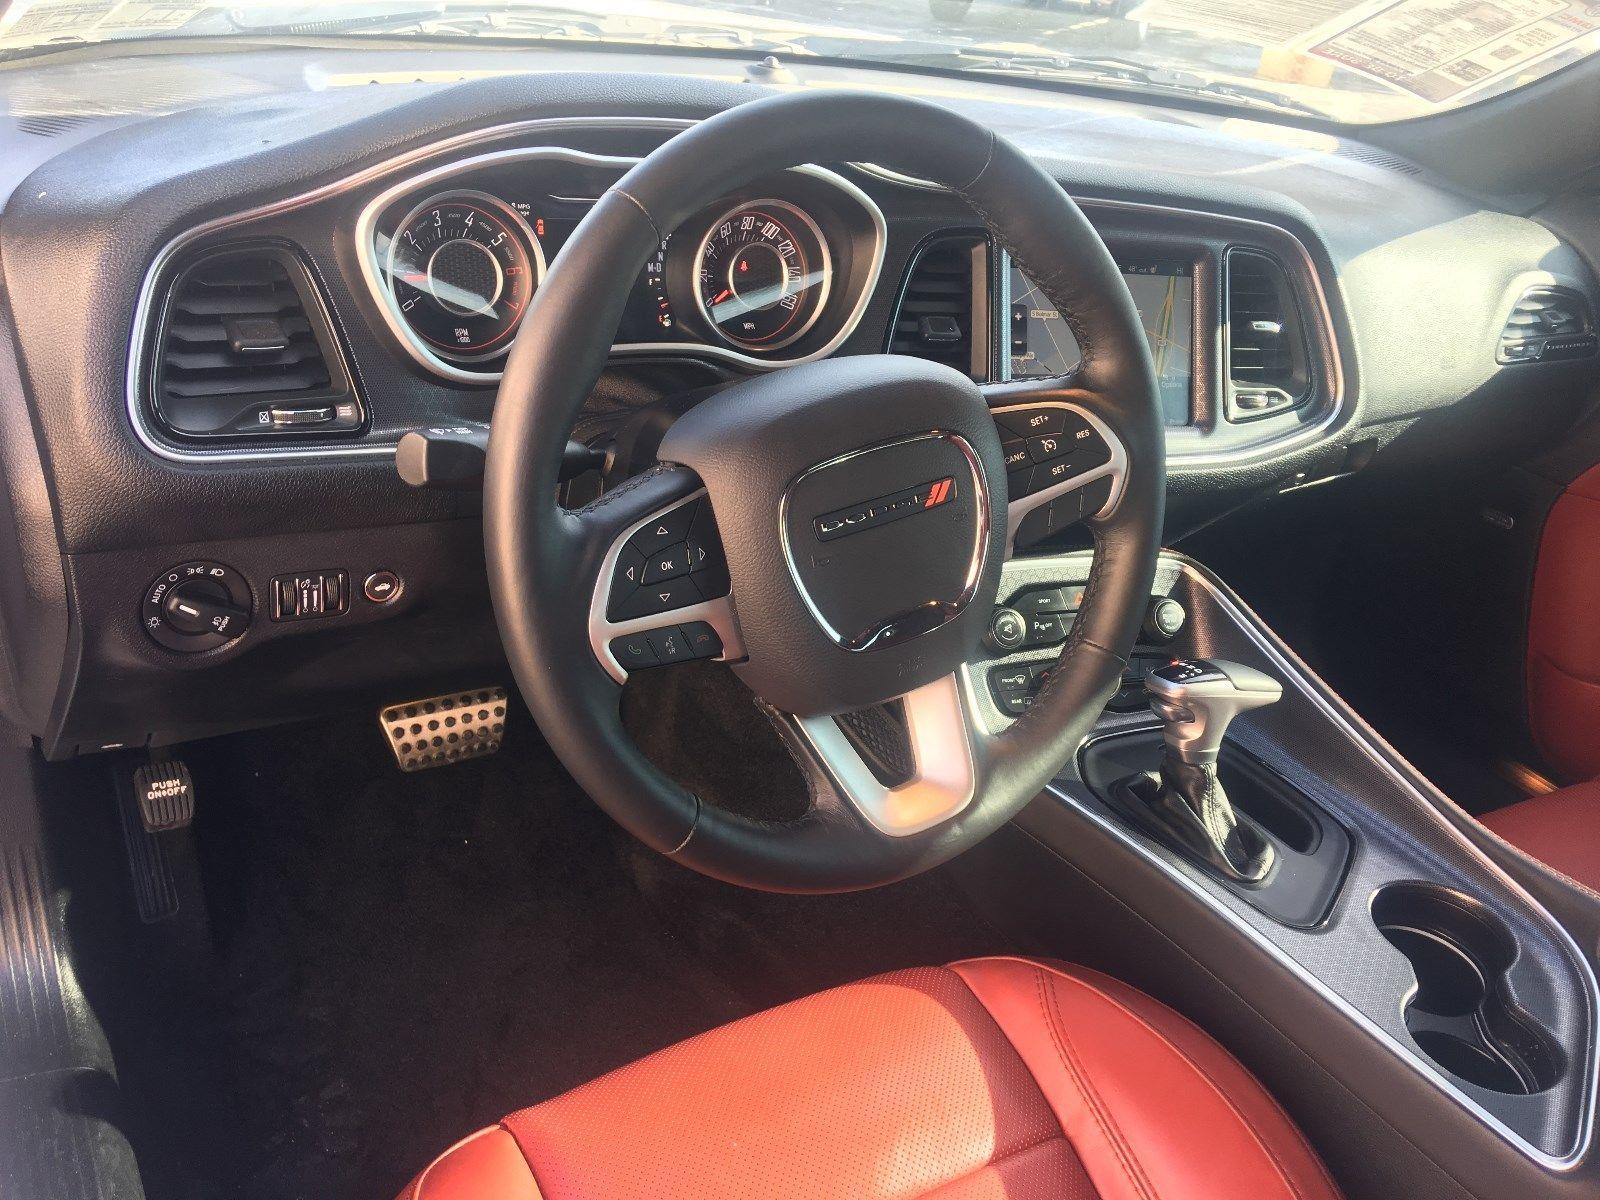 2016 Toyota Highlander For Sale >> Great 2016 Dodge Challenger White Dodge Challenger R/T ...